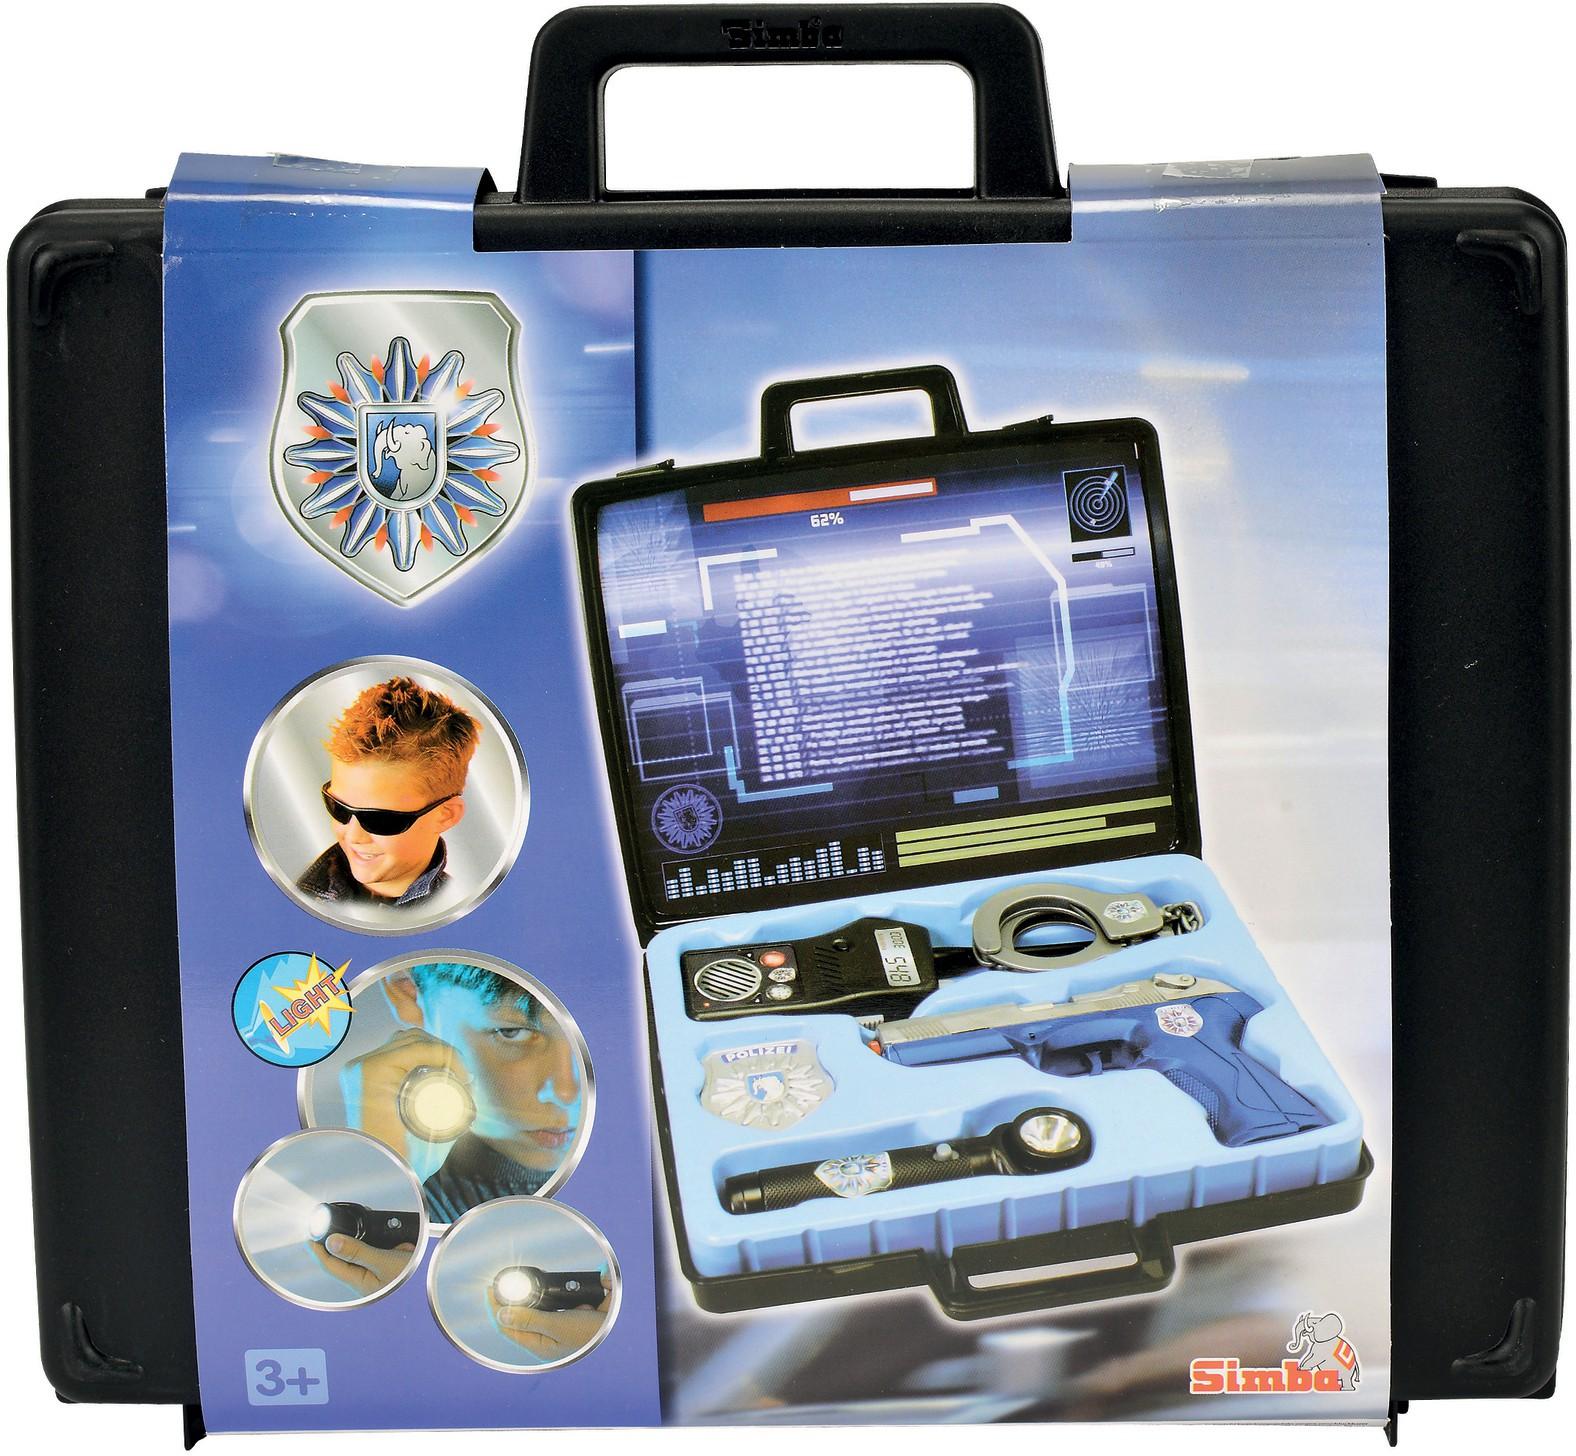 Deals | Toys for Kids Spy Gear, Disney.